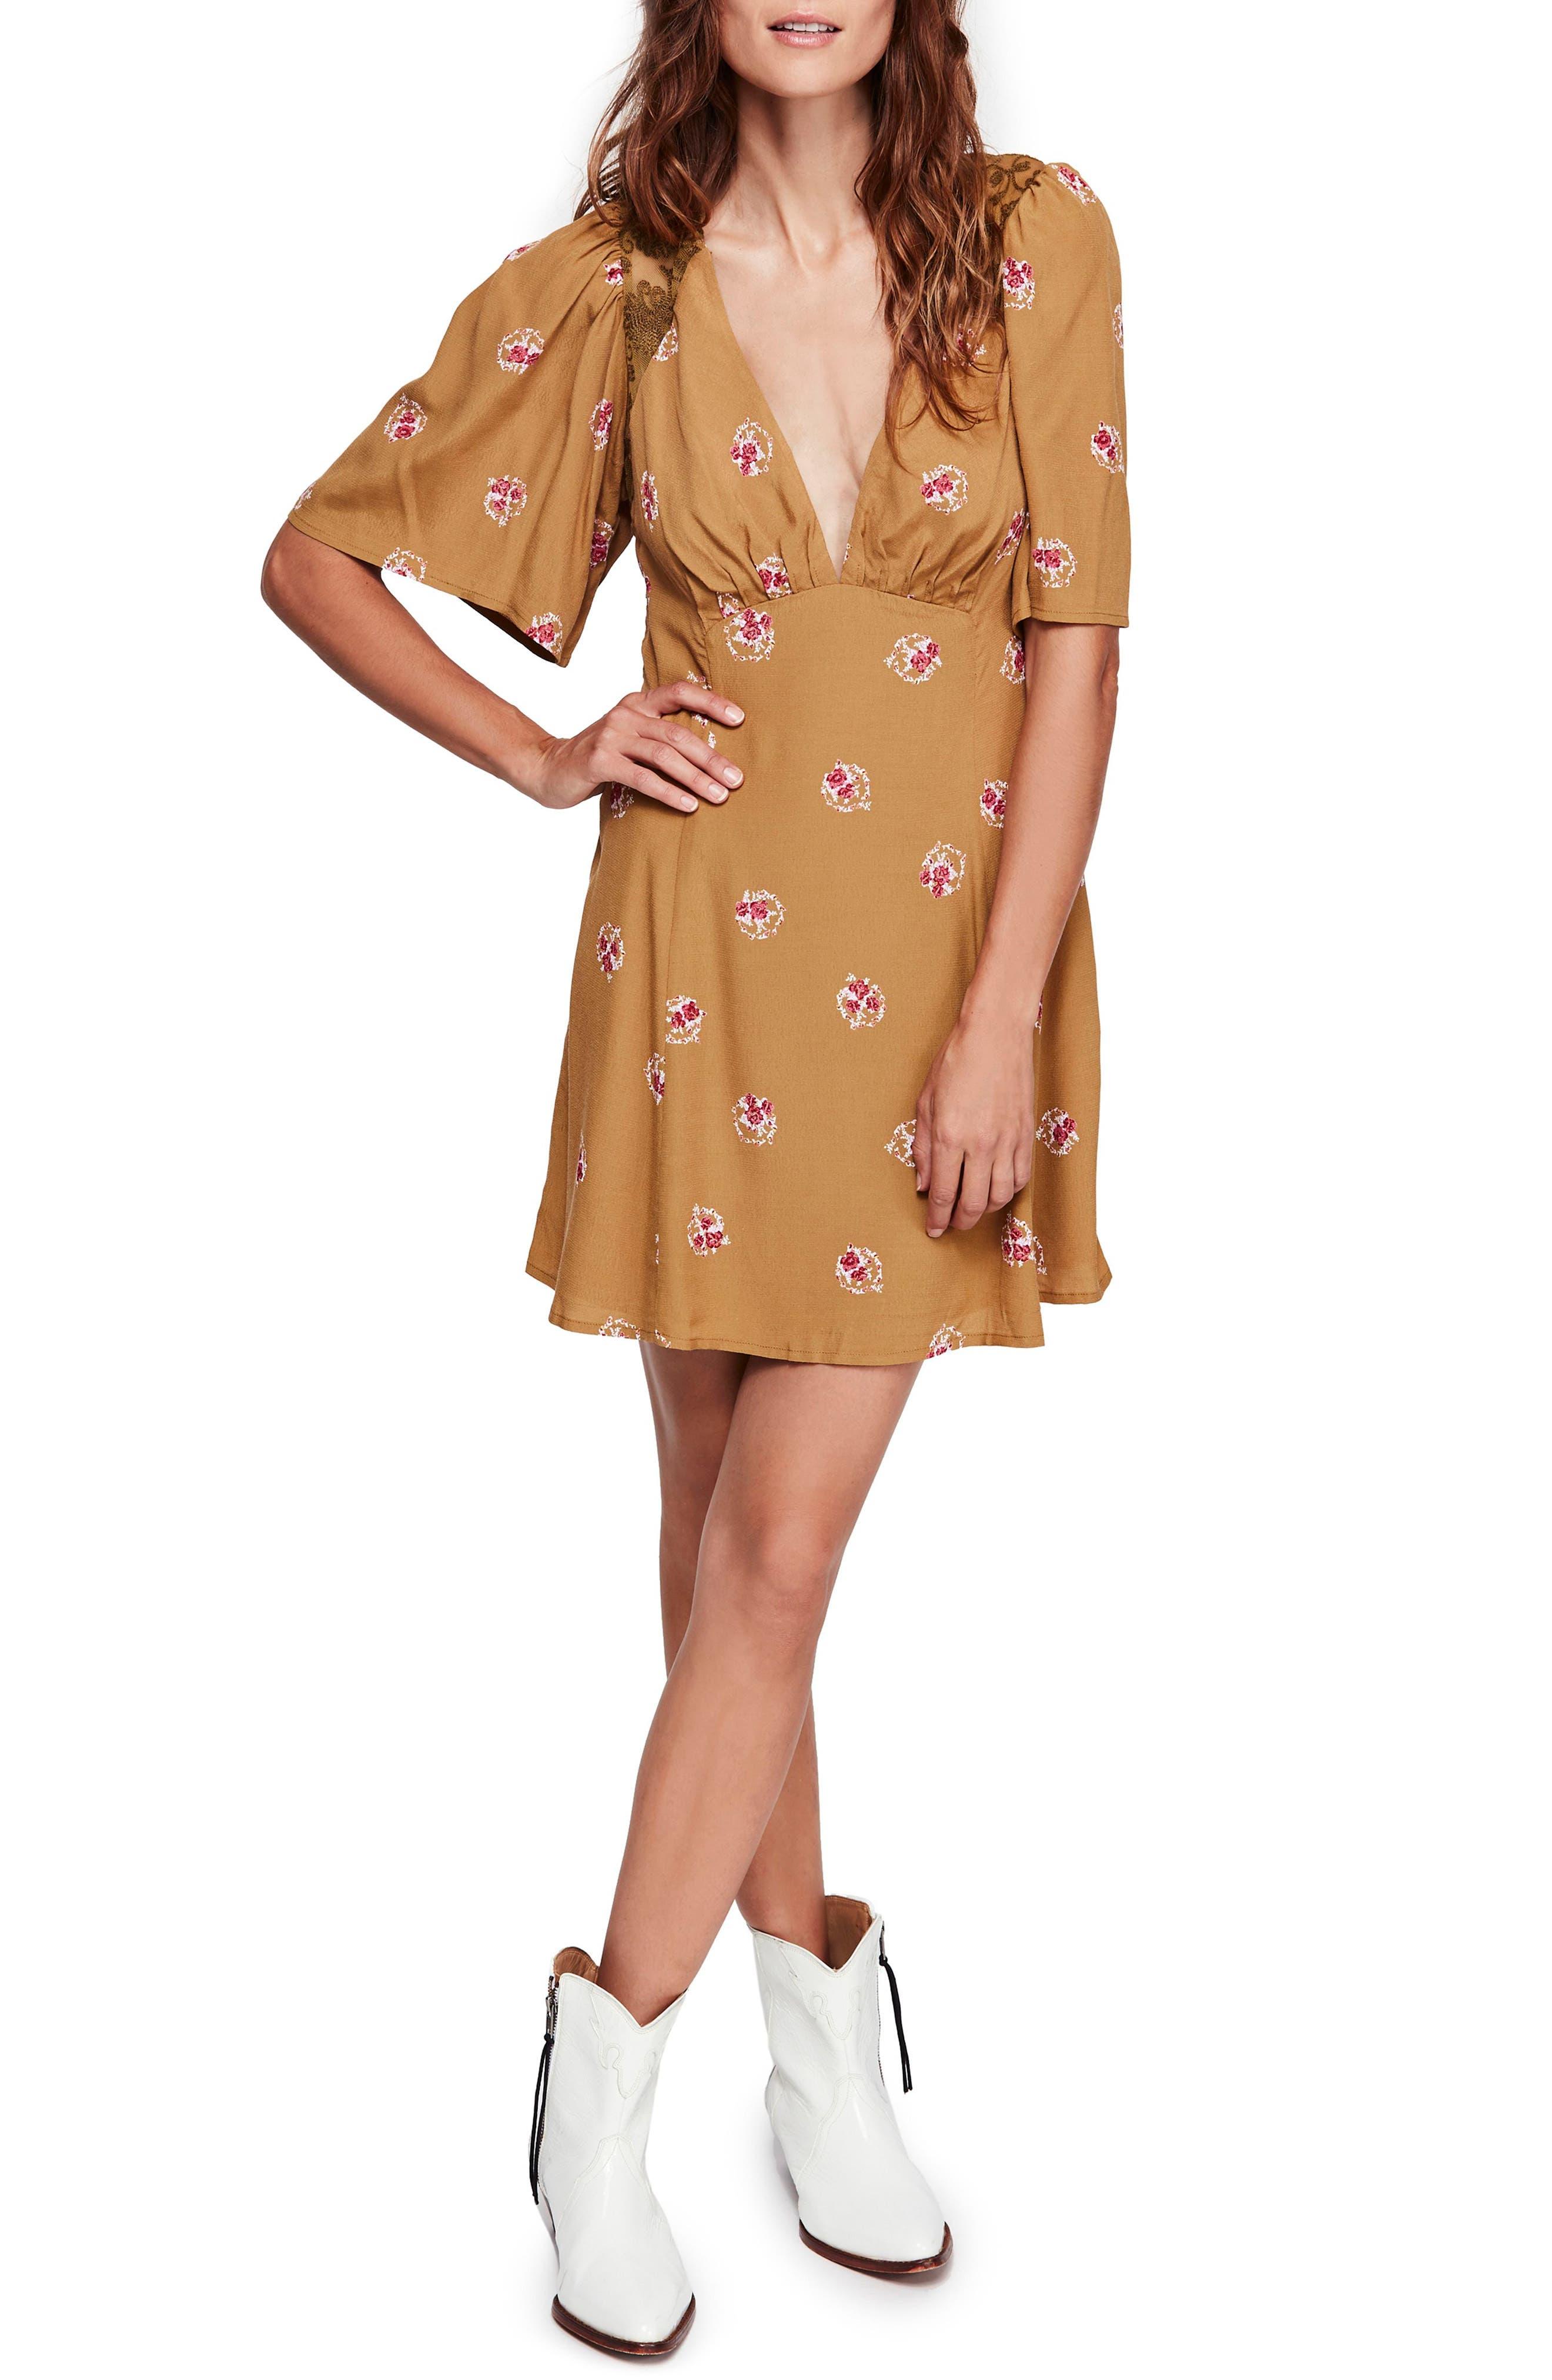 Free People Mockingbird Embroidered Mesh Inset Minidress, Brown